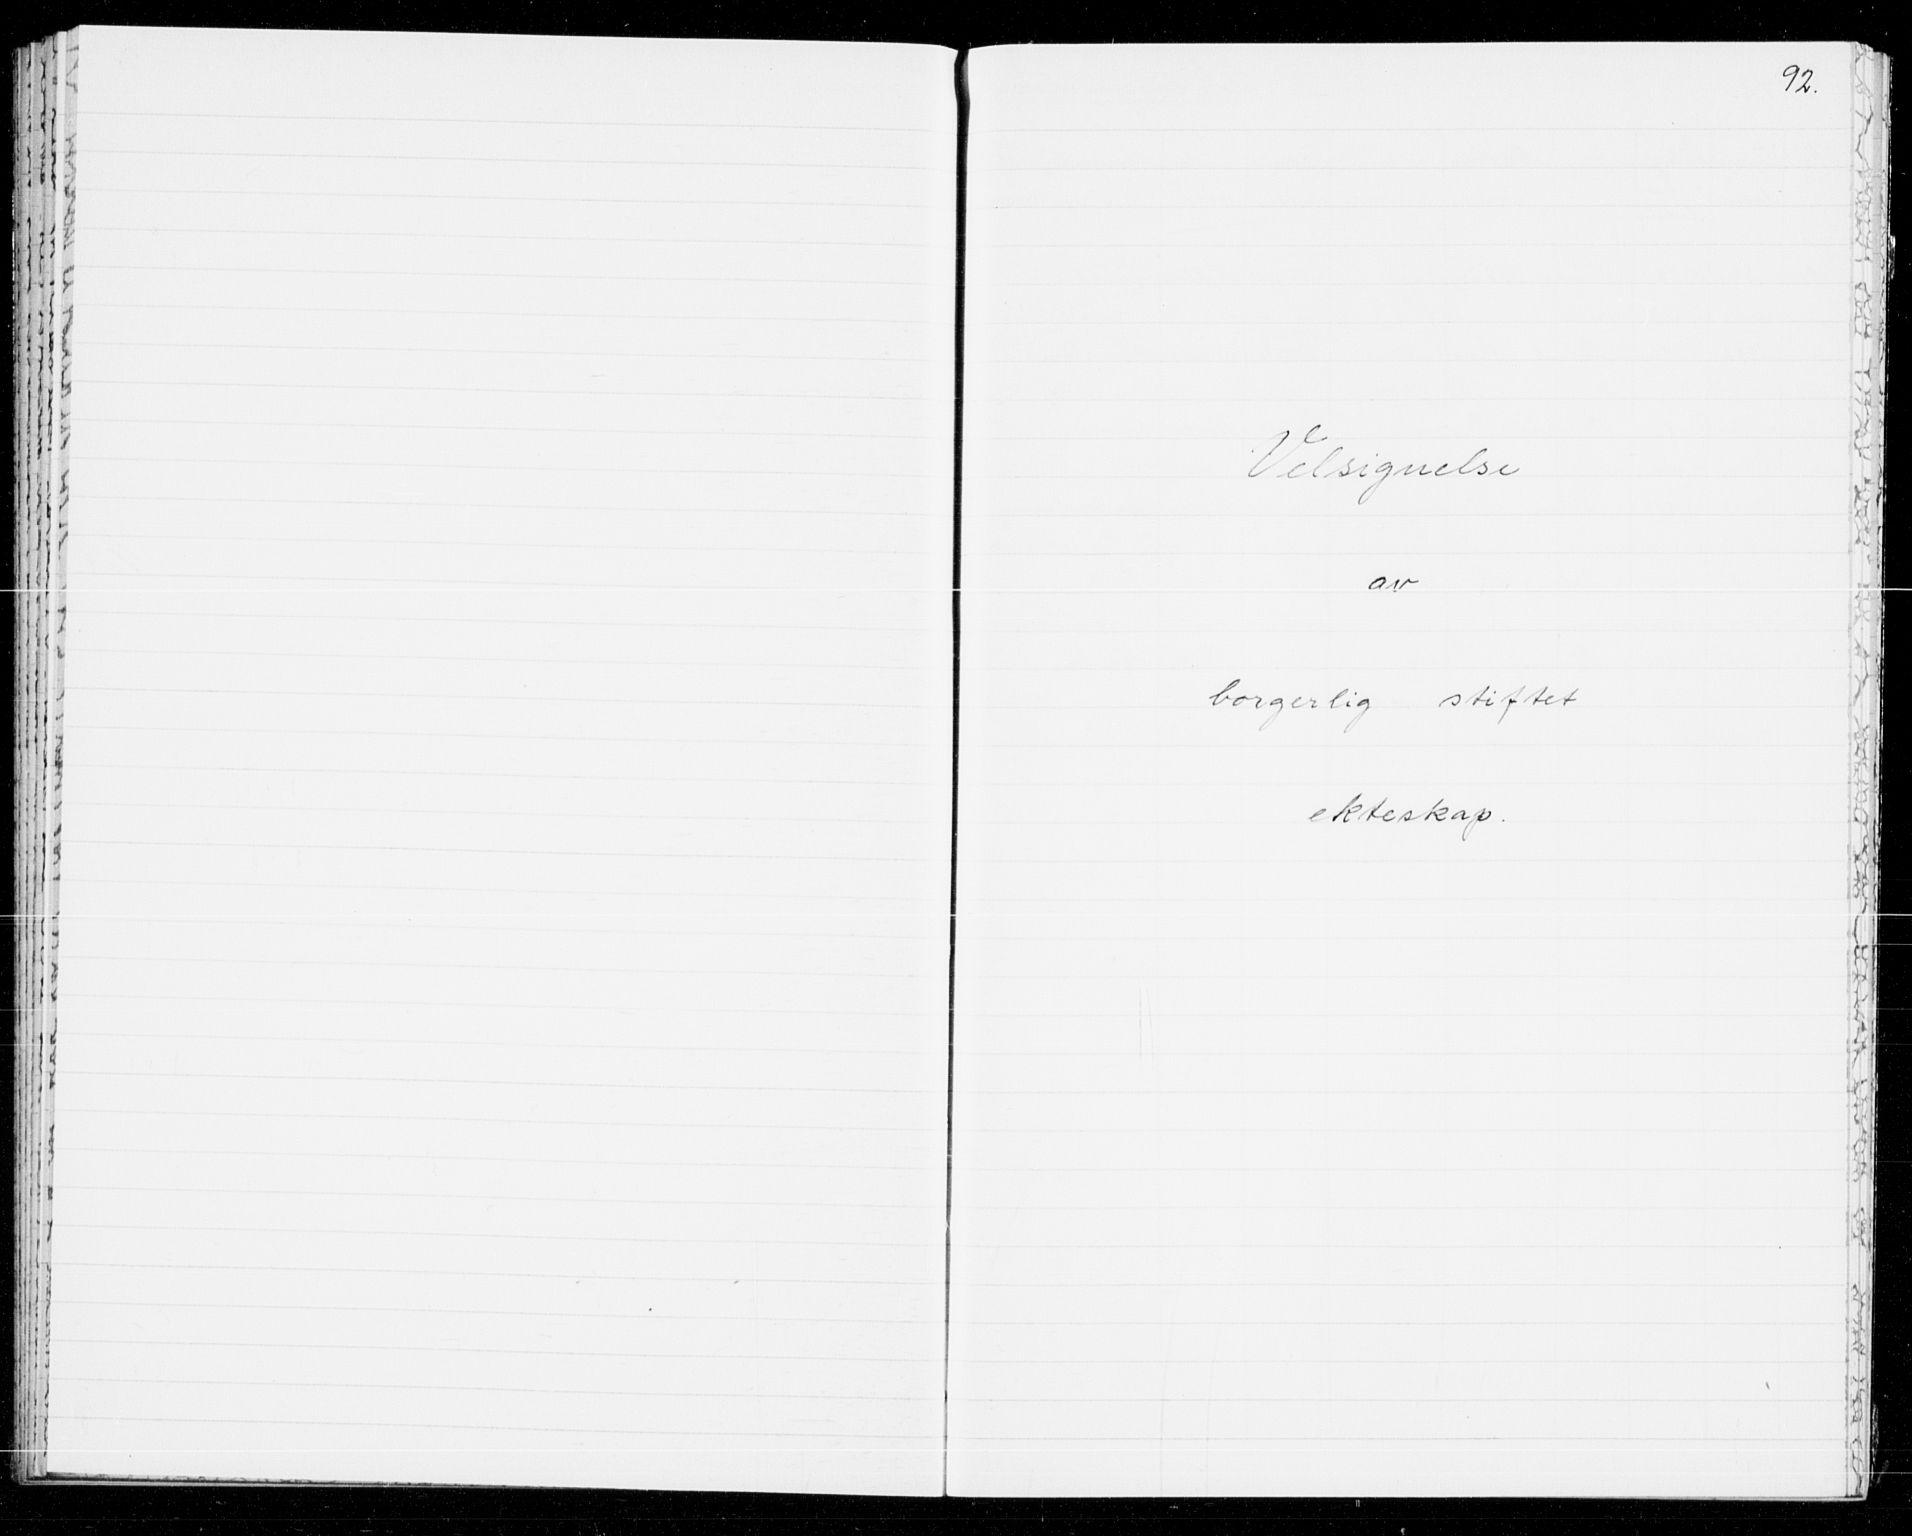 SAKO, Holla kirkebøker, G/Gb/L0004: Klokkerbok nr. II 4, 1942-1943, s. 92